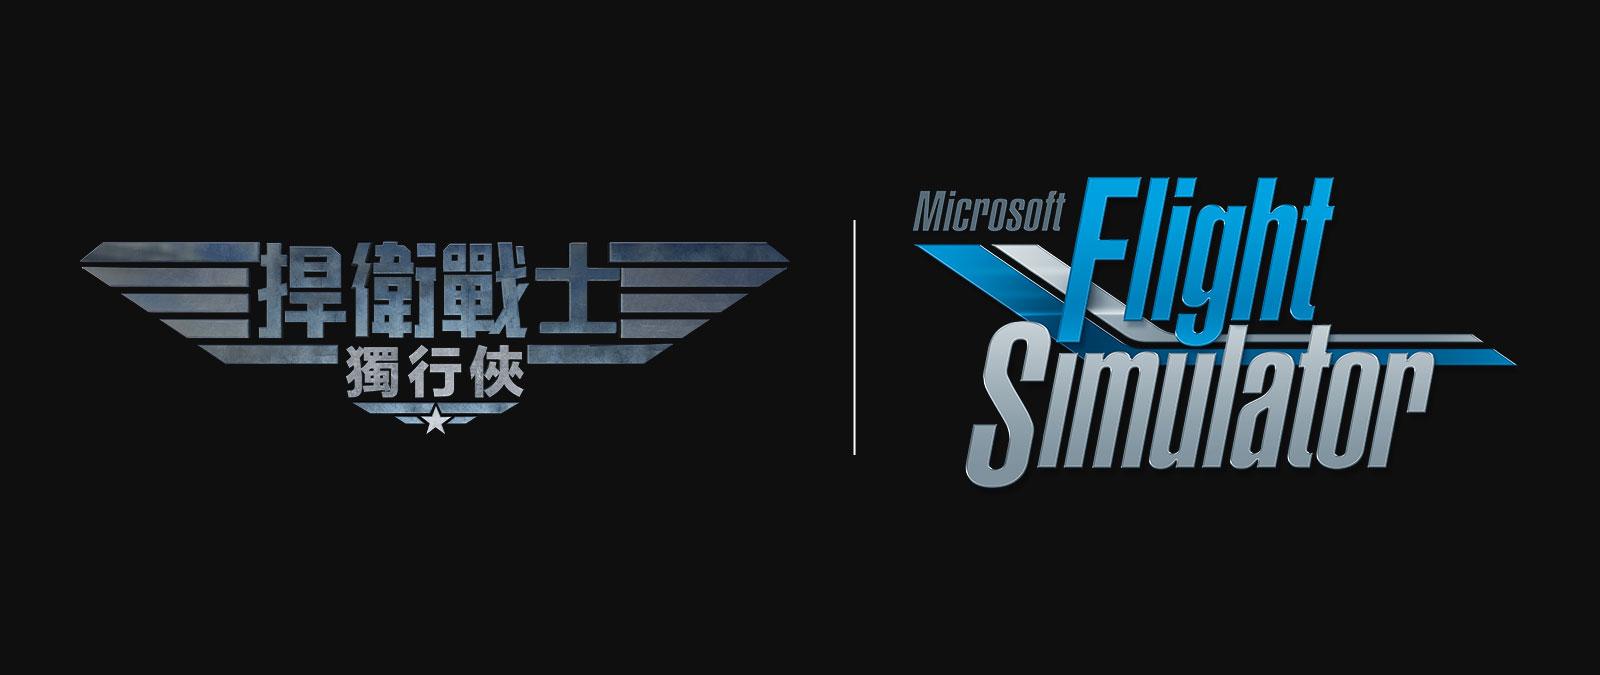 Microsoft Flight Simulator 標誌和 Top Gun 標誌